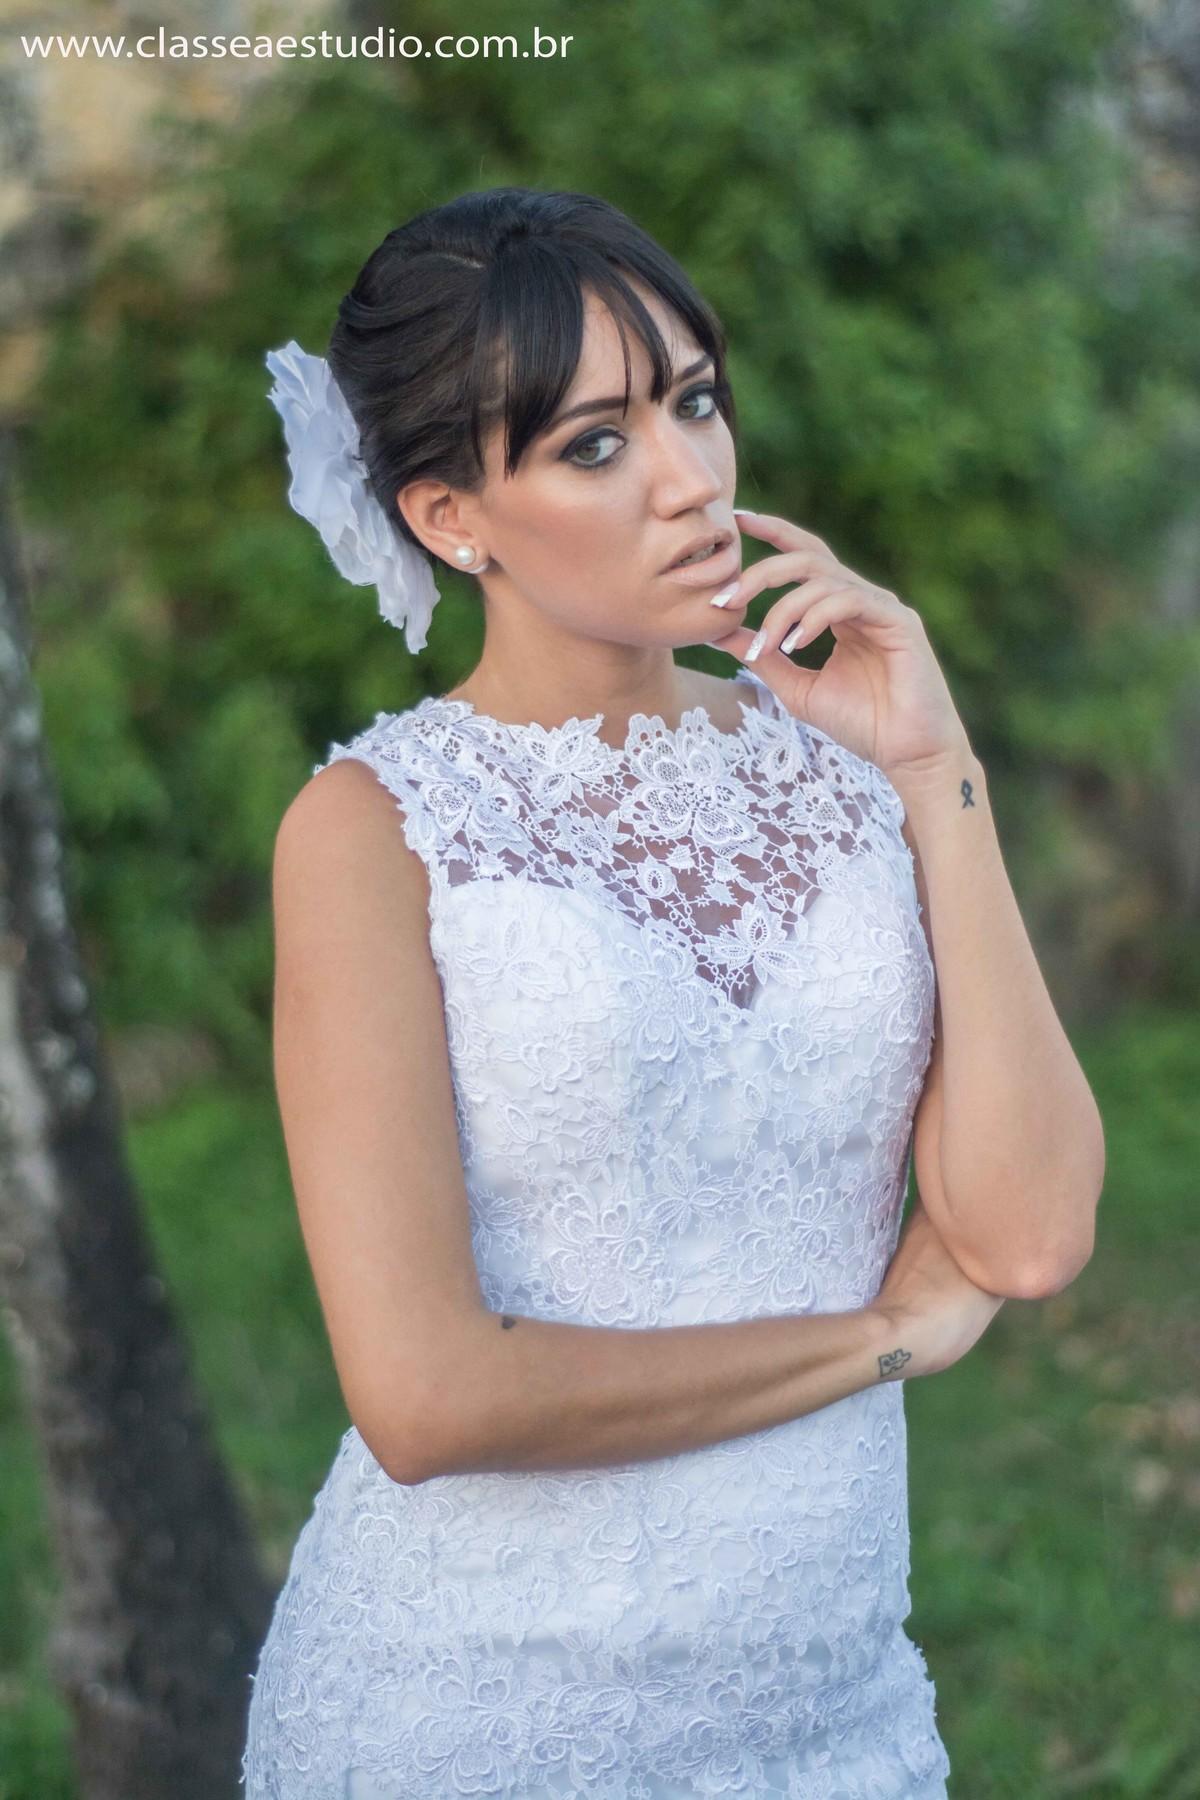 Editorial de casamento de noiva para o evento wedding day recifeEditorial de casamento de noiva para o evento wedding day recife